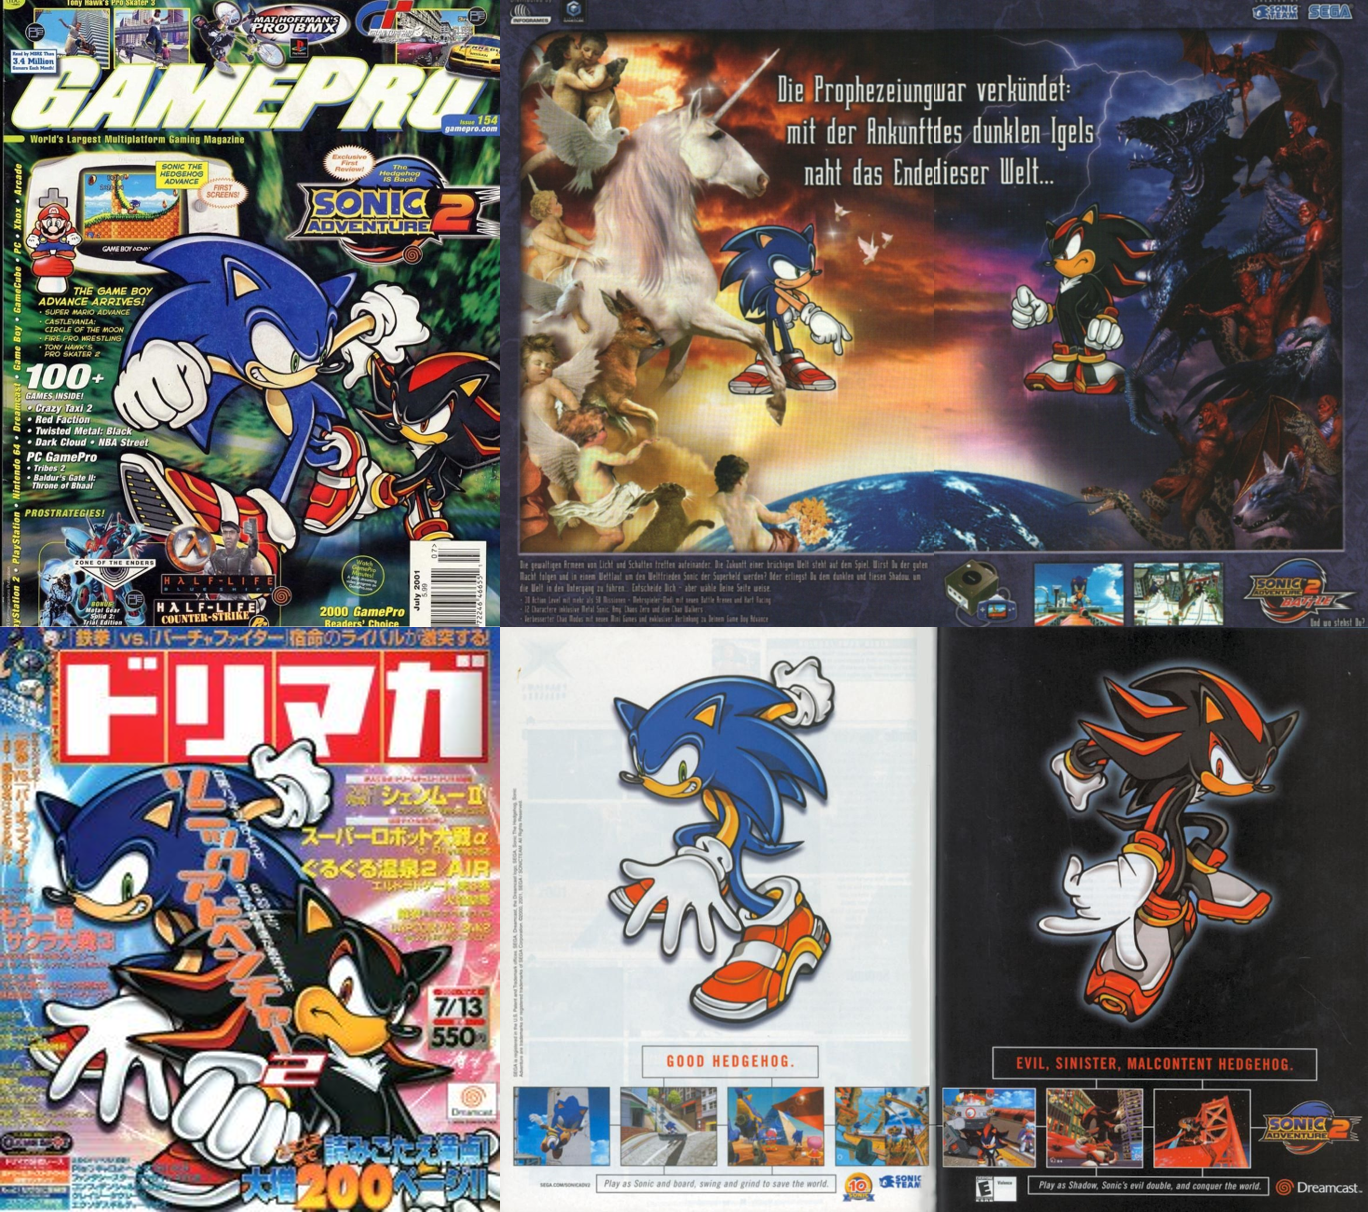 Sonic Adventure 2 Magazine Promos Sonic The Hedgehog Know Your Meme